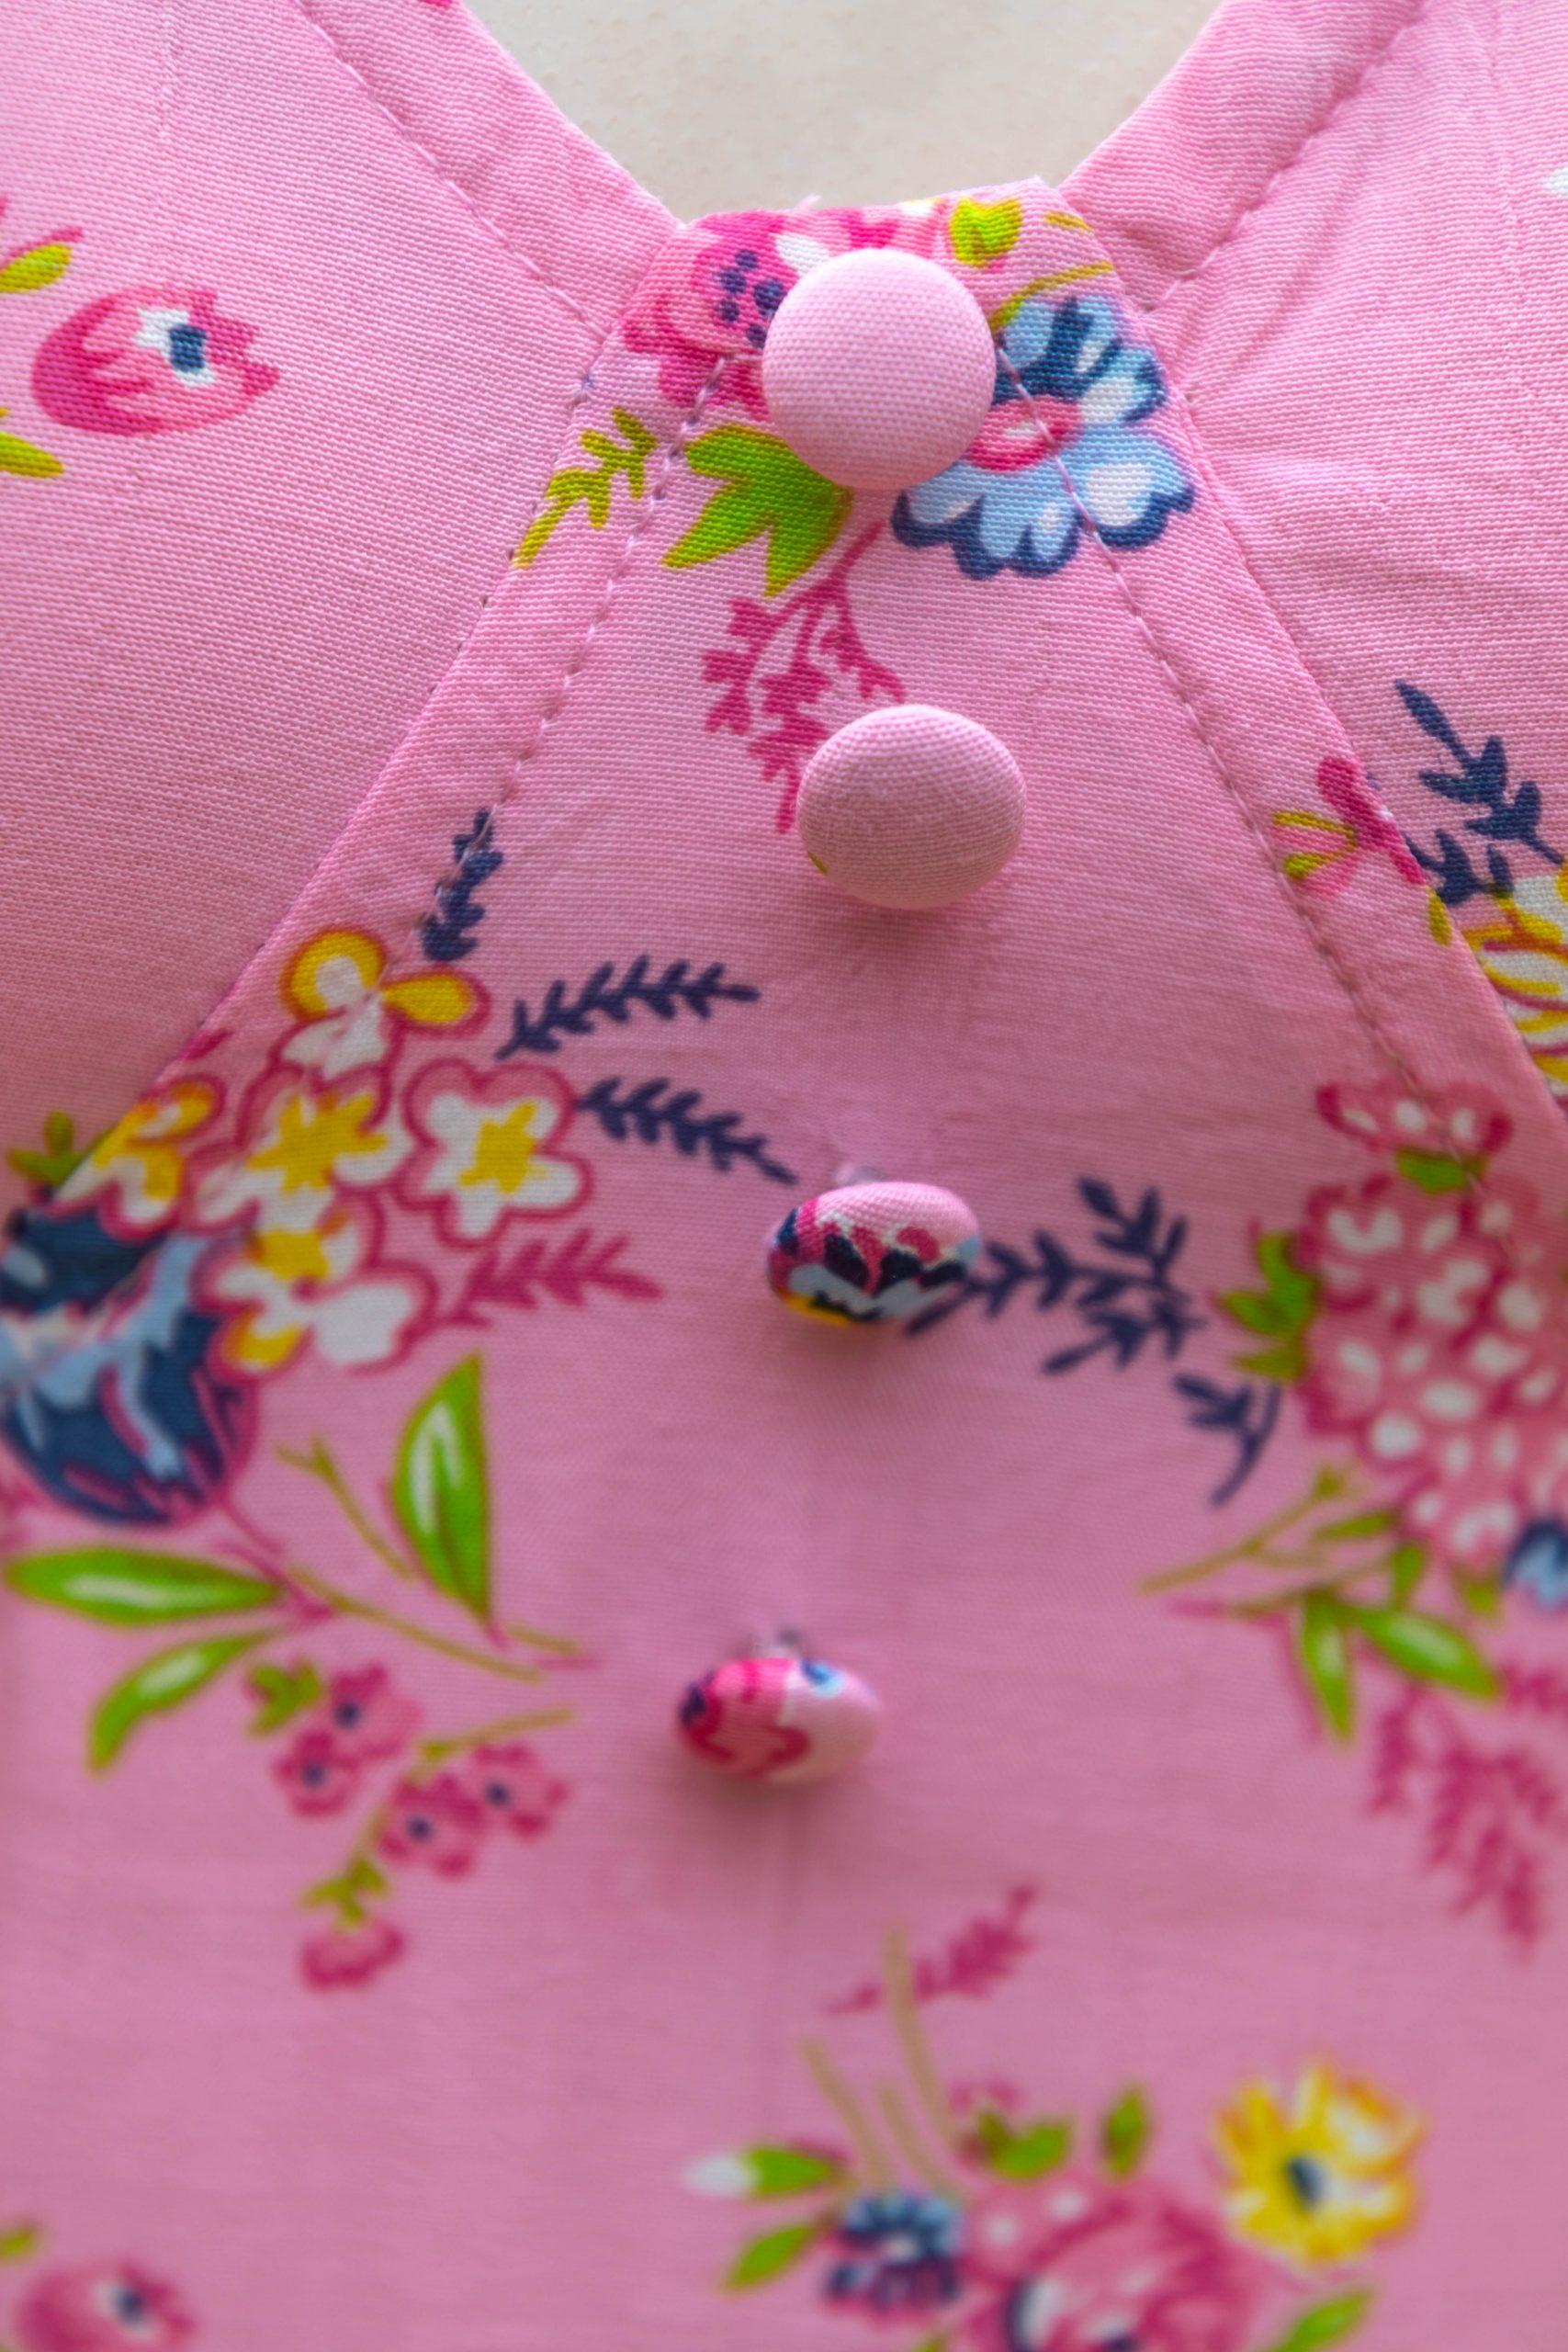 Faithful The Brand Pink Floral Daija Midi Dress Worn by Annie Fairfax